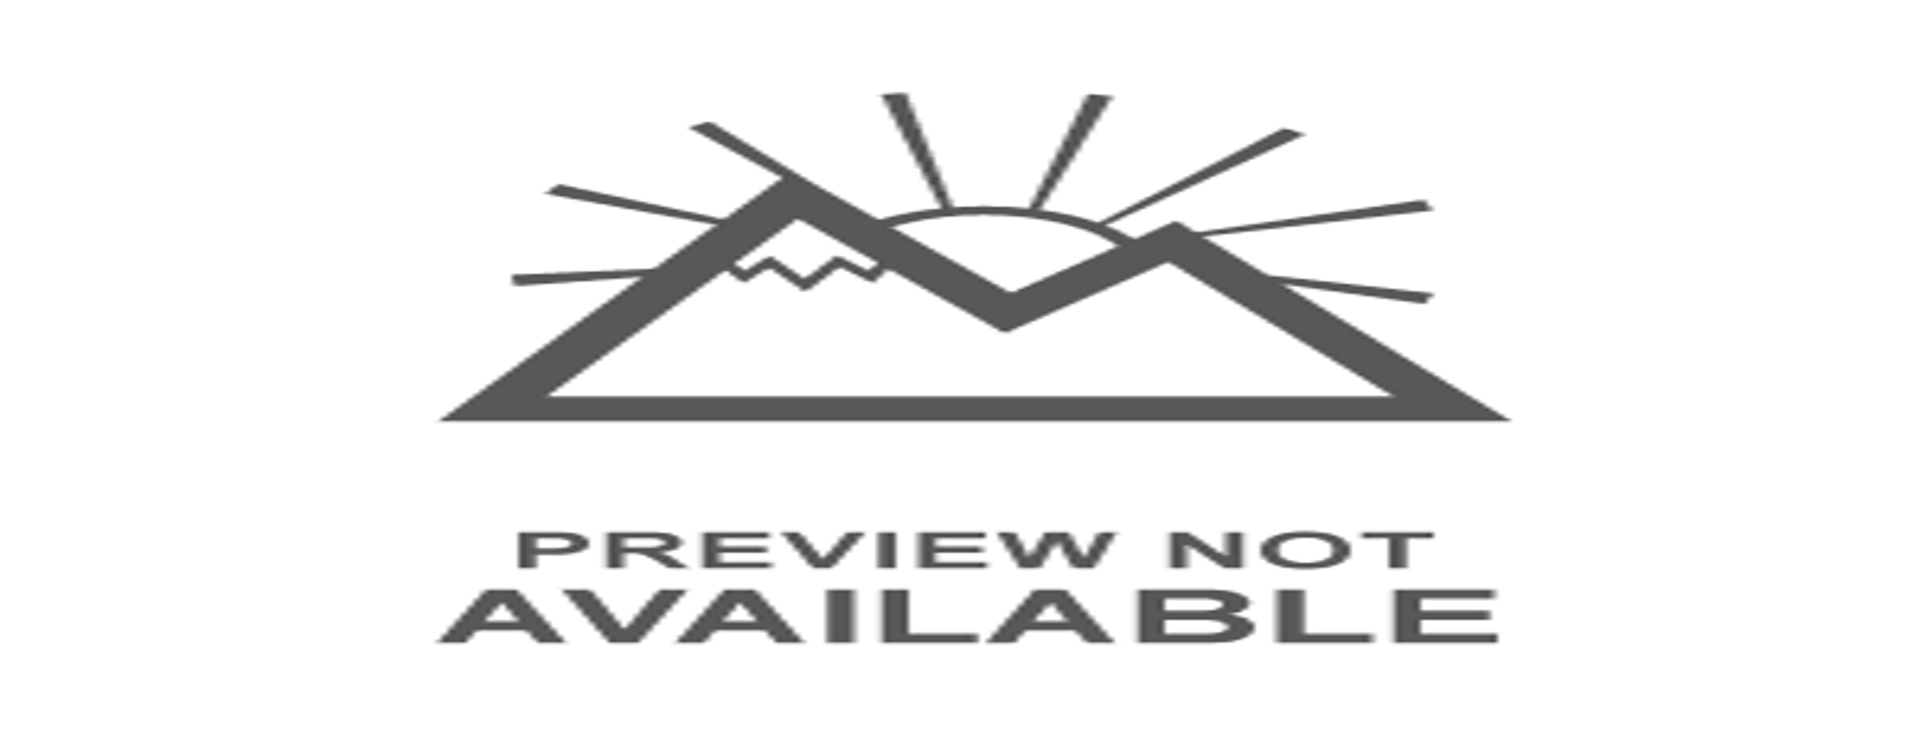 A nighttime shot of the Orlando Starflyer